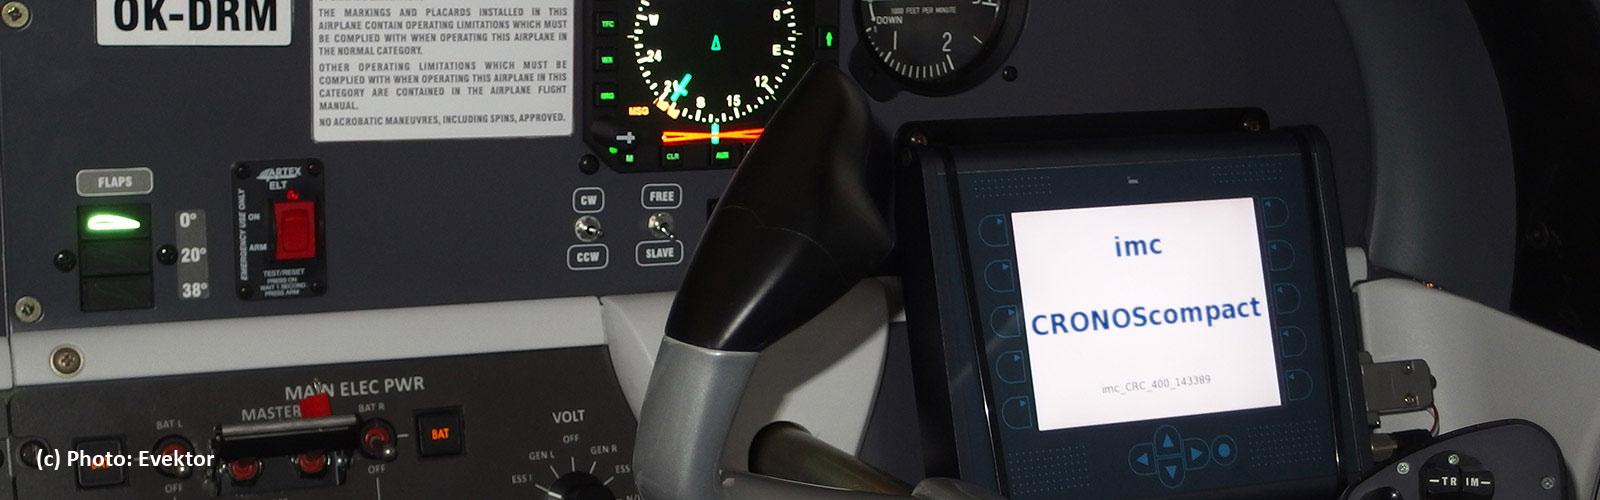 Flugversuch - produktiv messen